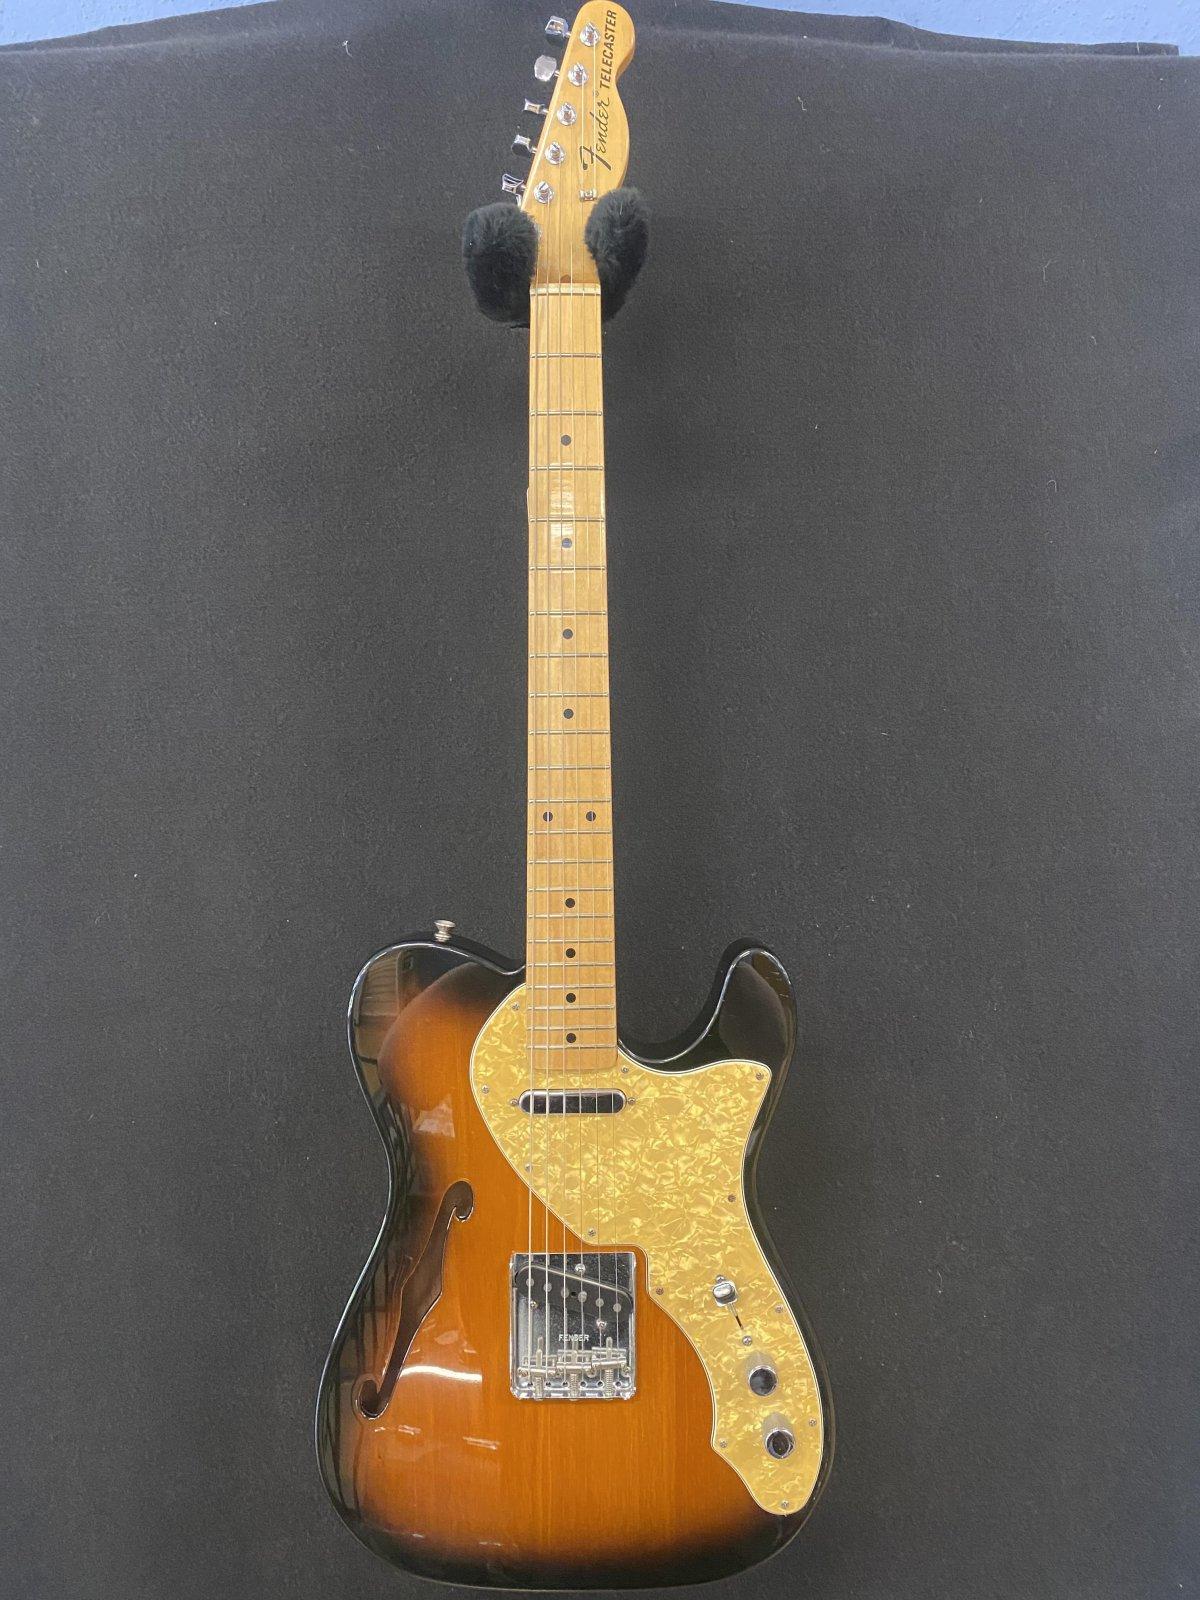 Used Fender Deluxe Thinline Telecaster